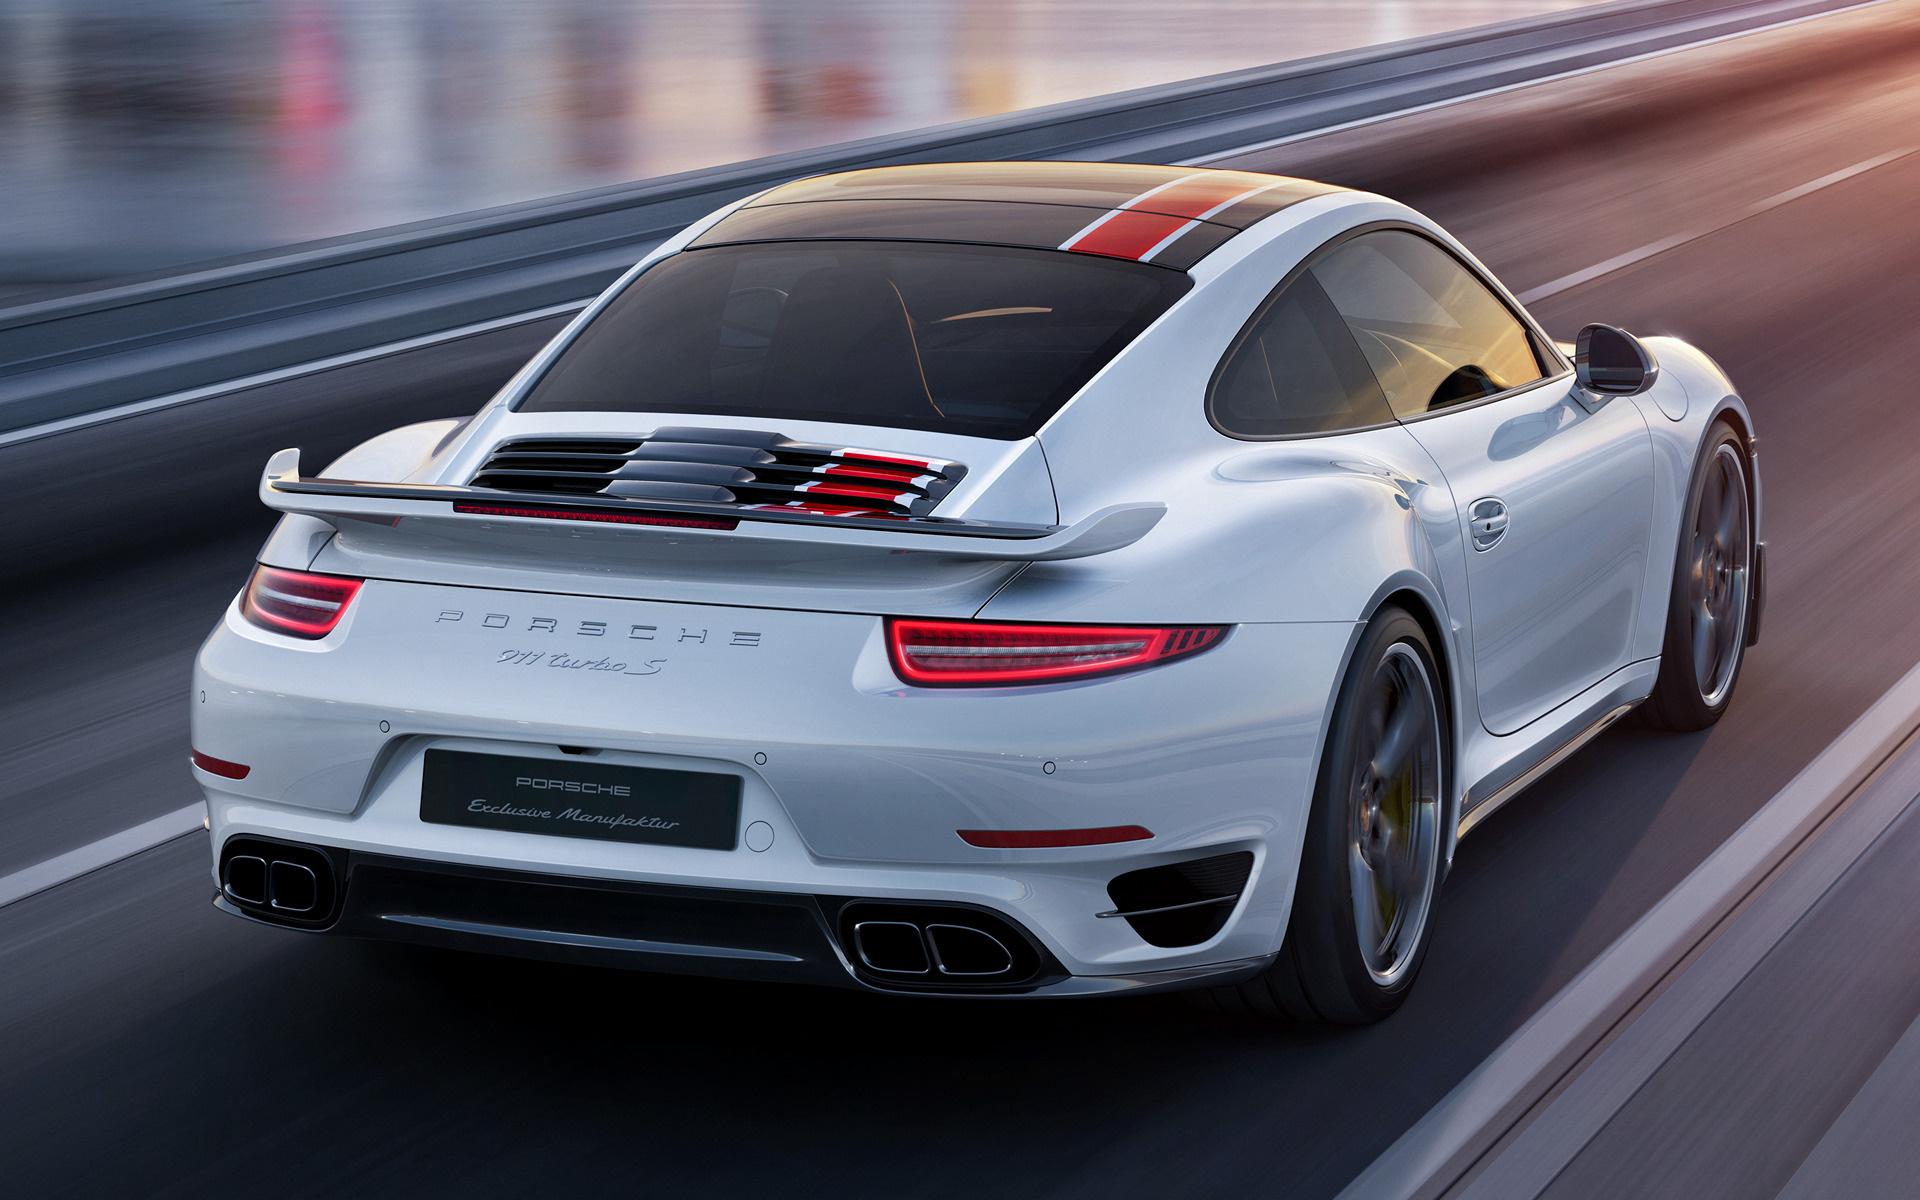 wide 85 - 2015 Porsche 911 Turbo Wallpaper